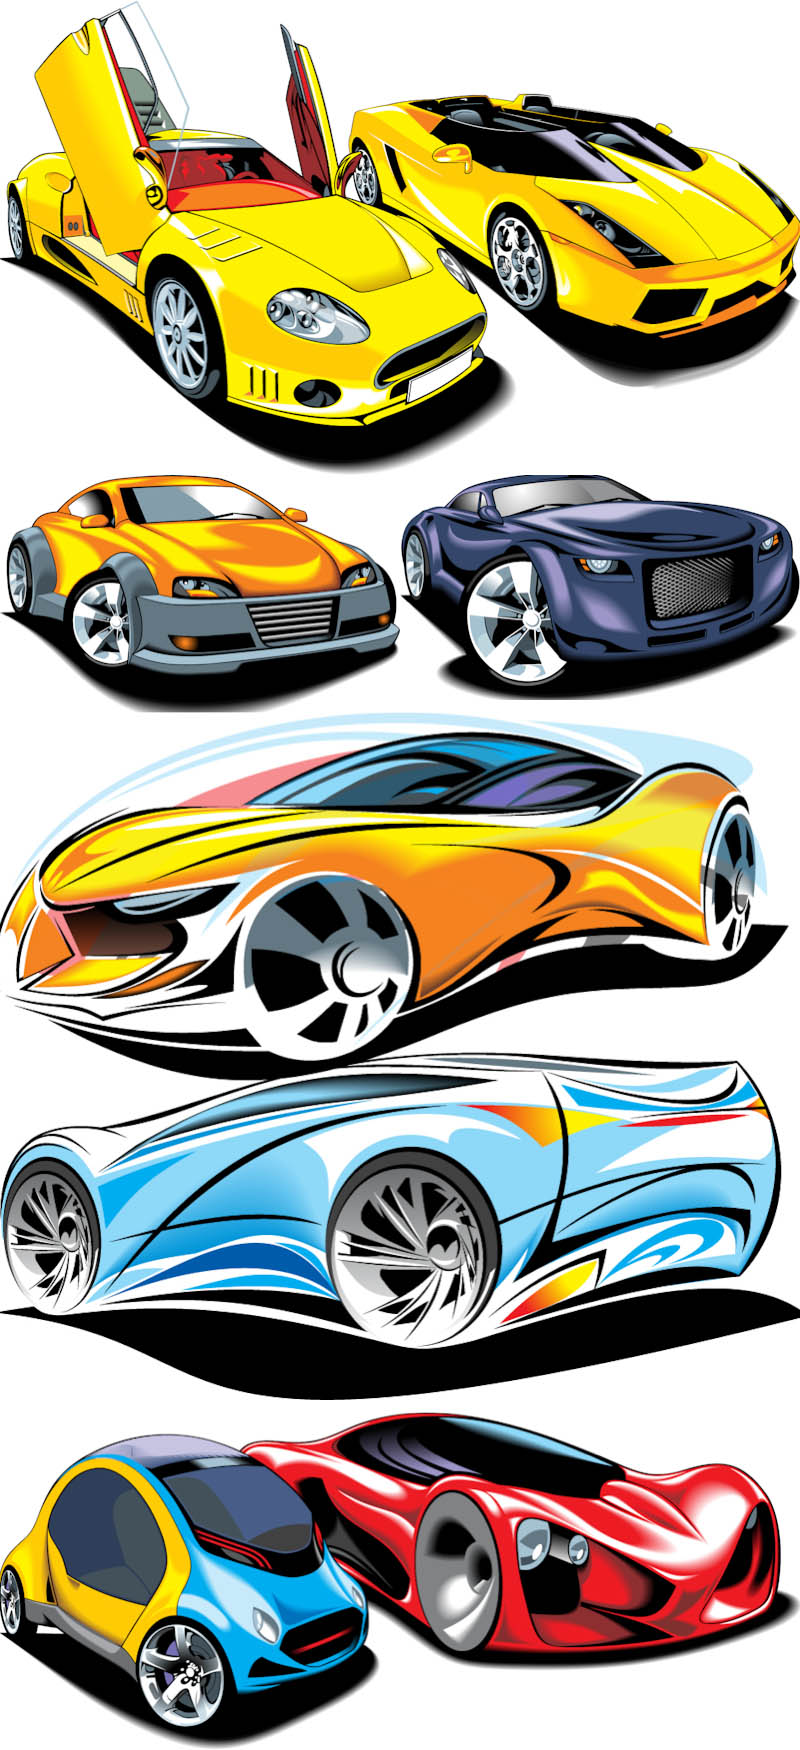 free vector graphics sites